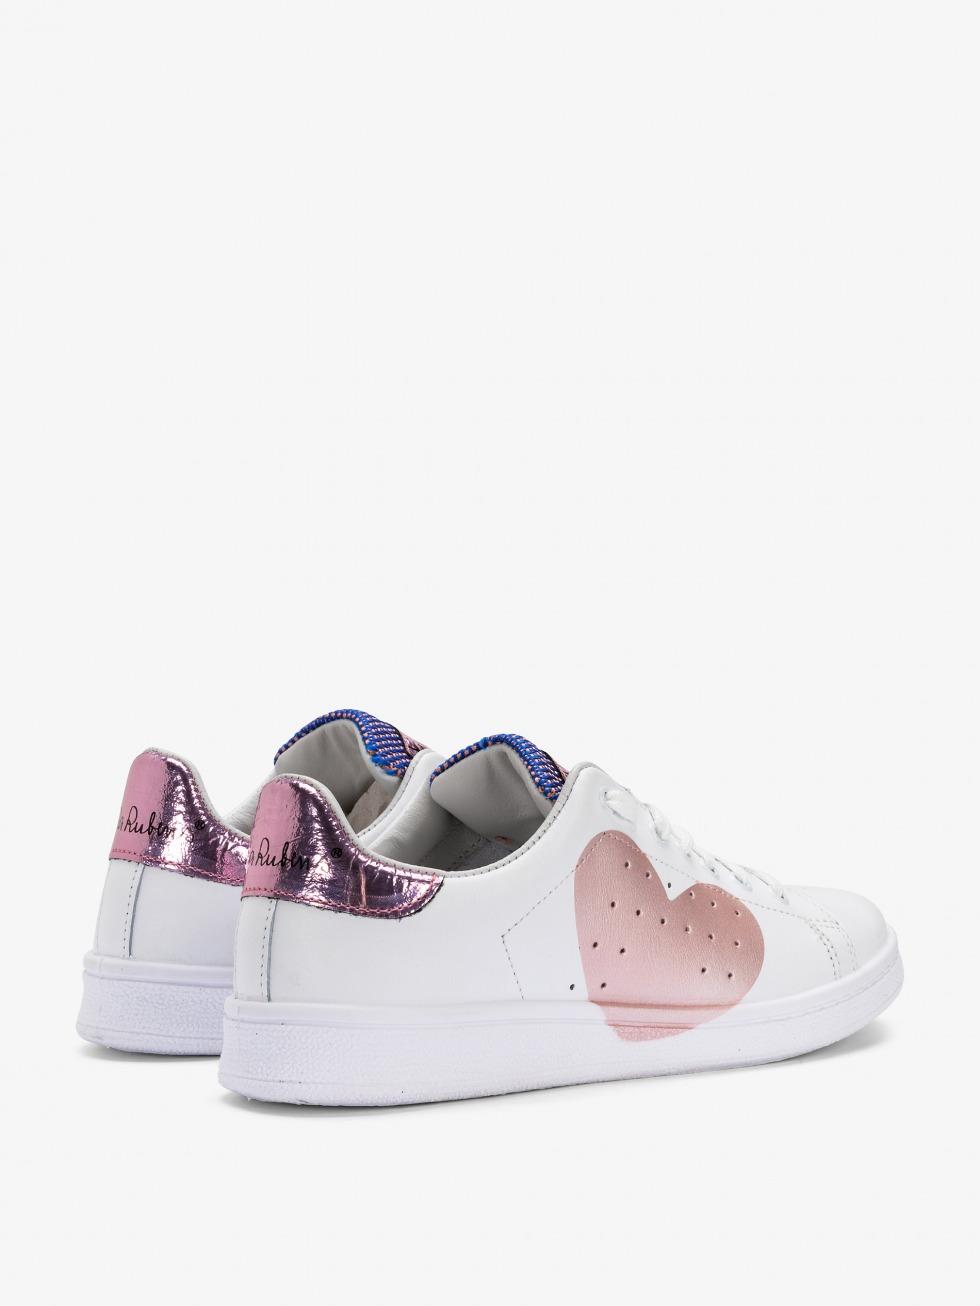 Daiquiri Sneakers - Space Orchidea Heart